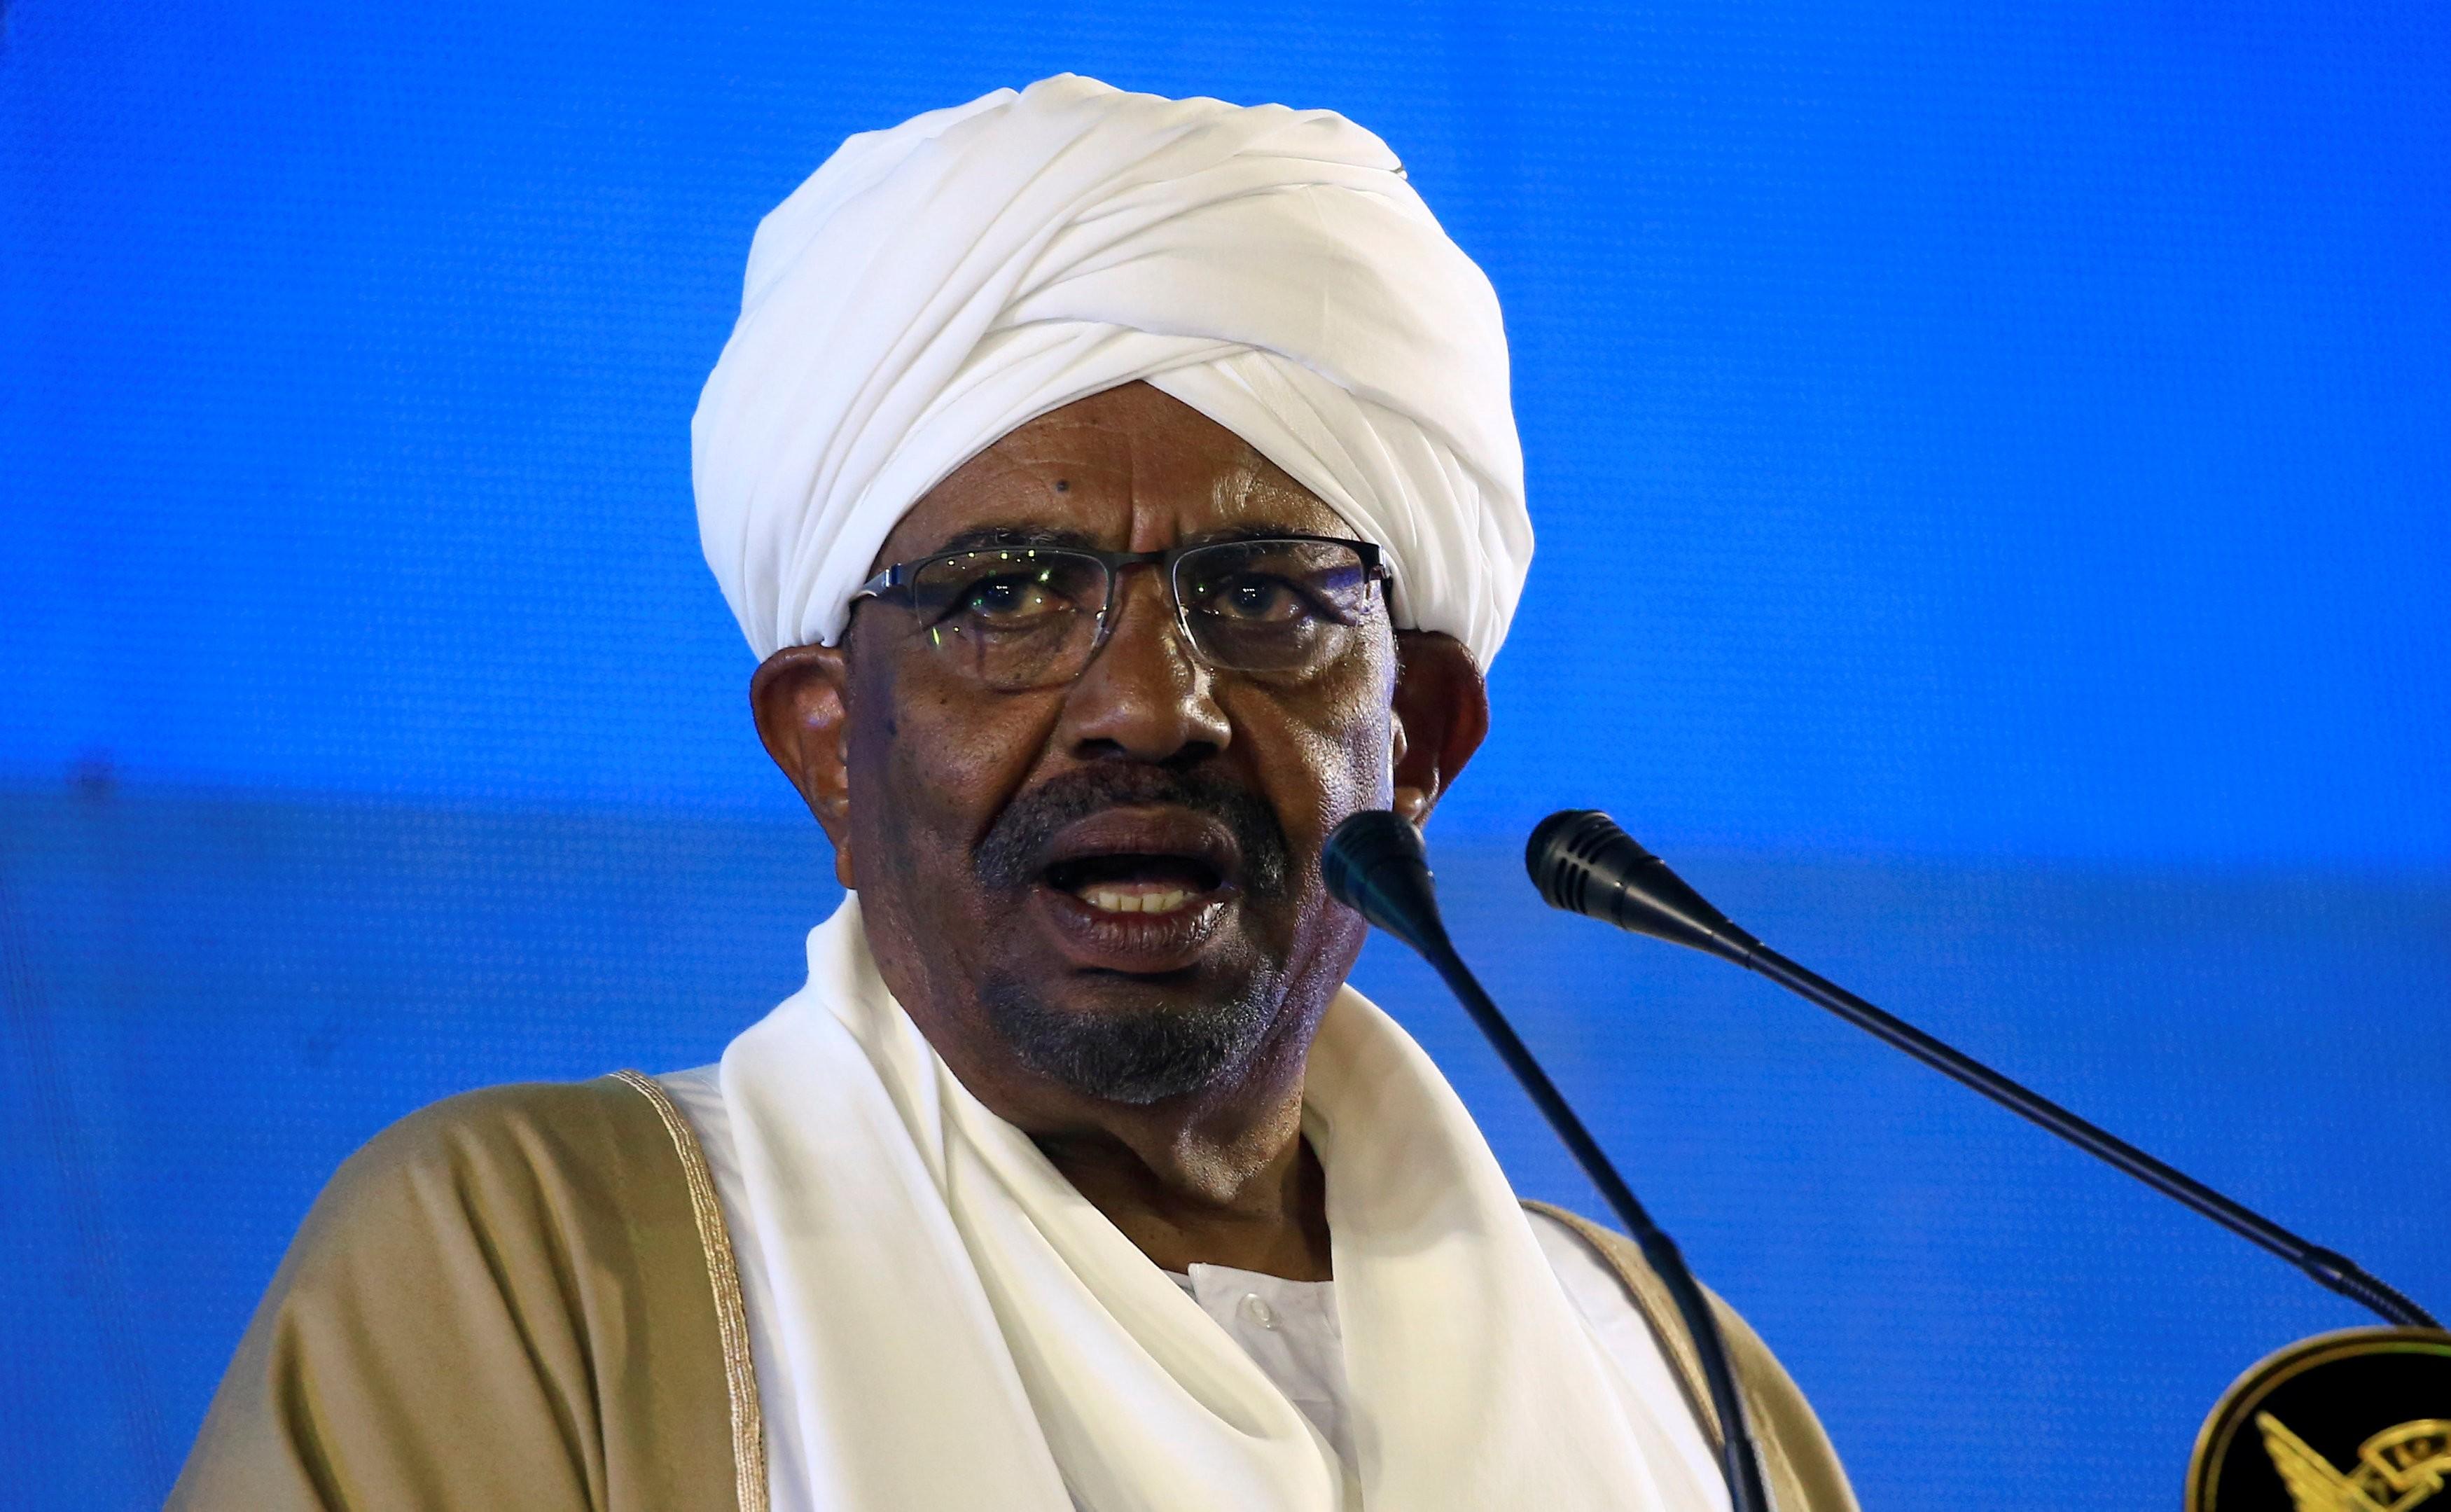 2018-12-31T201523Z_455530751_RC15A92DF770_RTRMADP_3_SUDAN-ANNIVERSARY.jpg